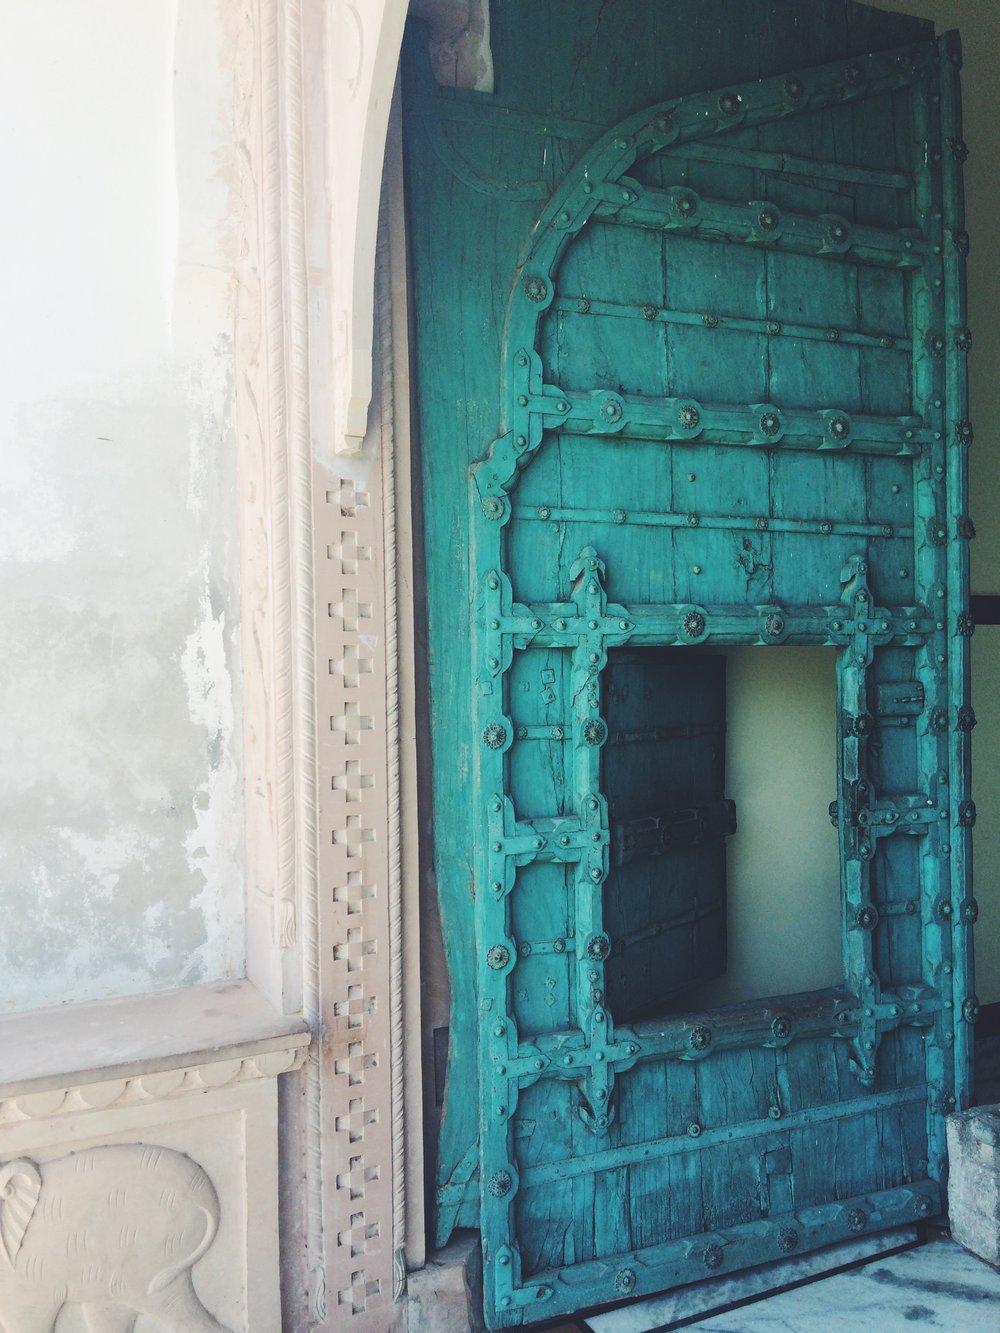 Tordi Palace, Tordi Garh, India.